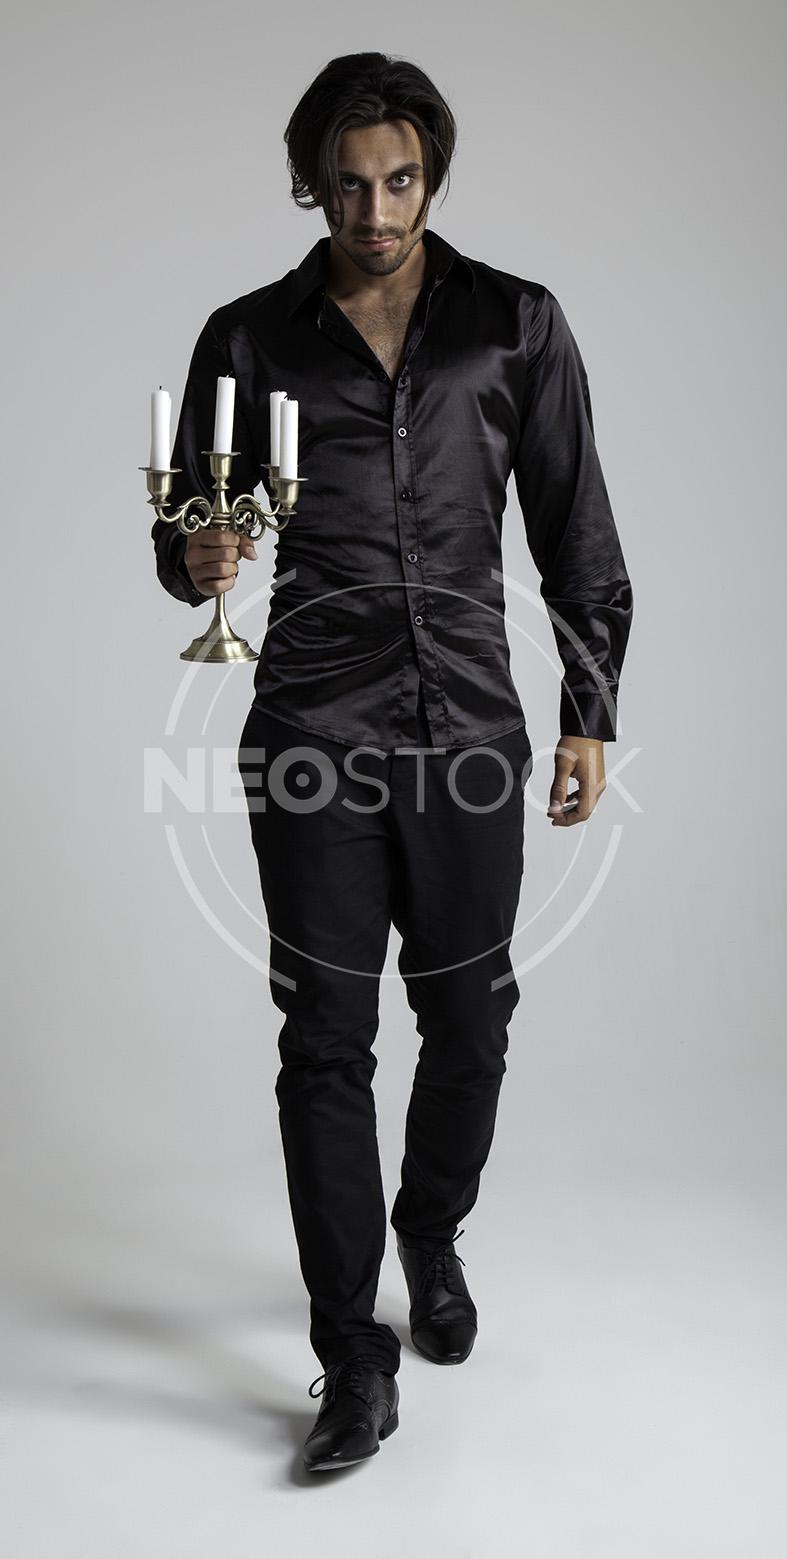 NeoStock -Donna Daniel V, Vampire Romance, Stock Photography